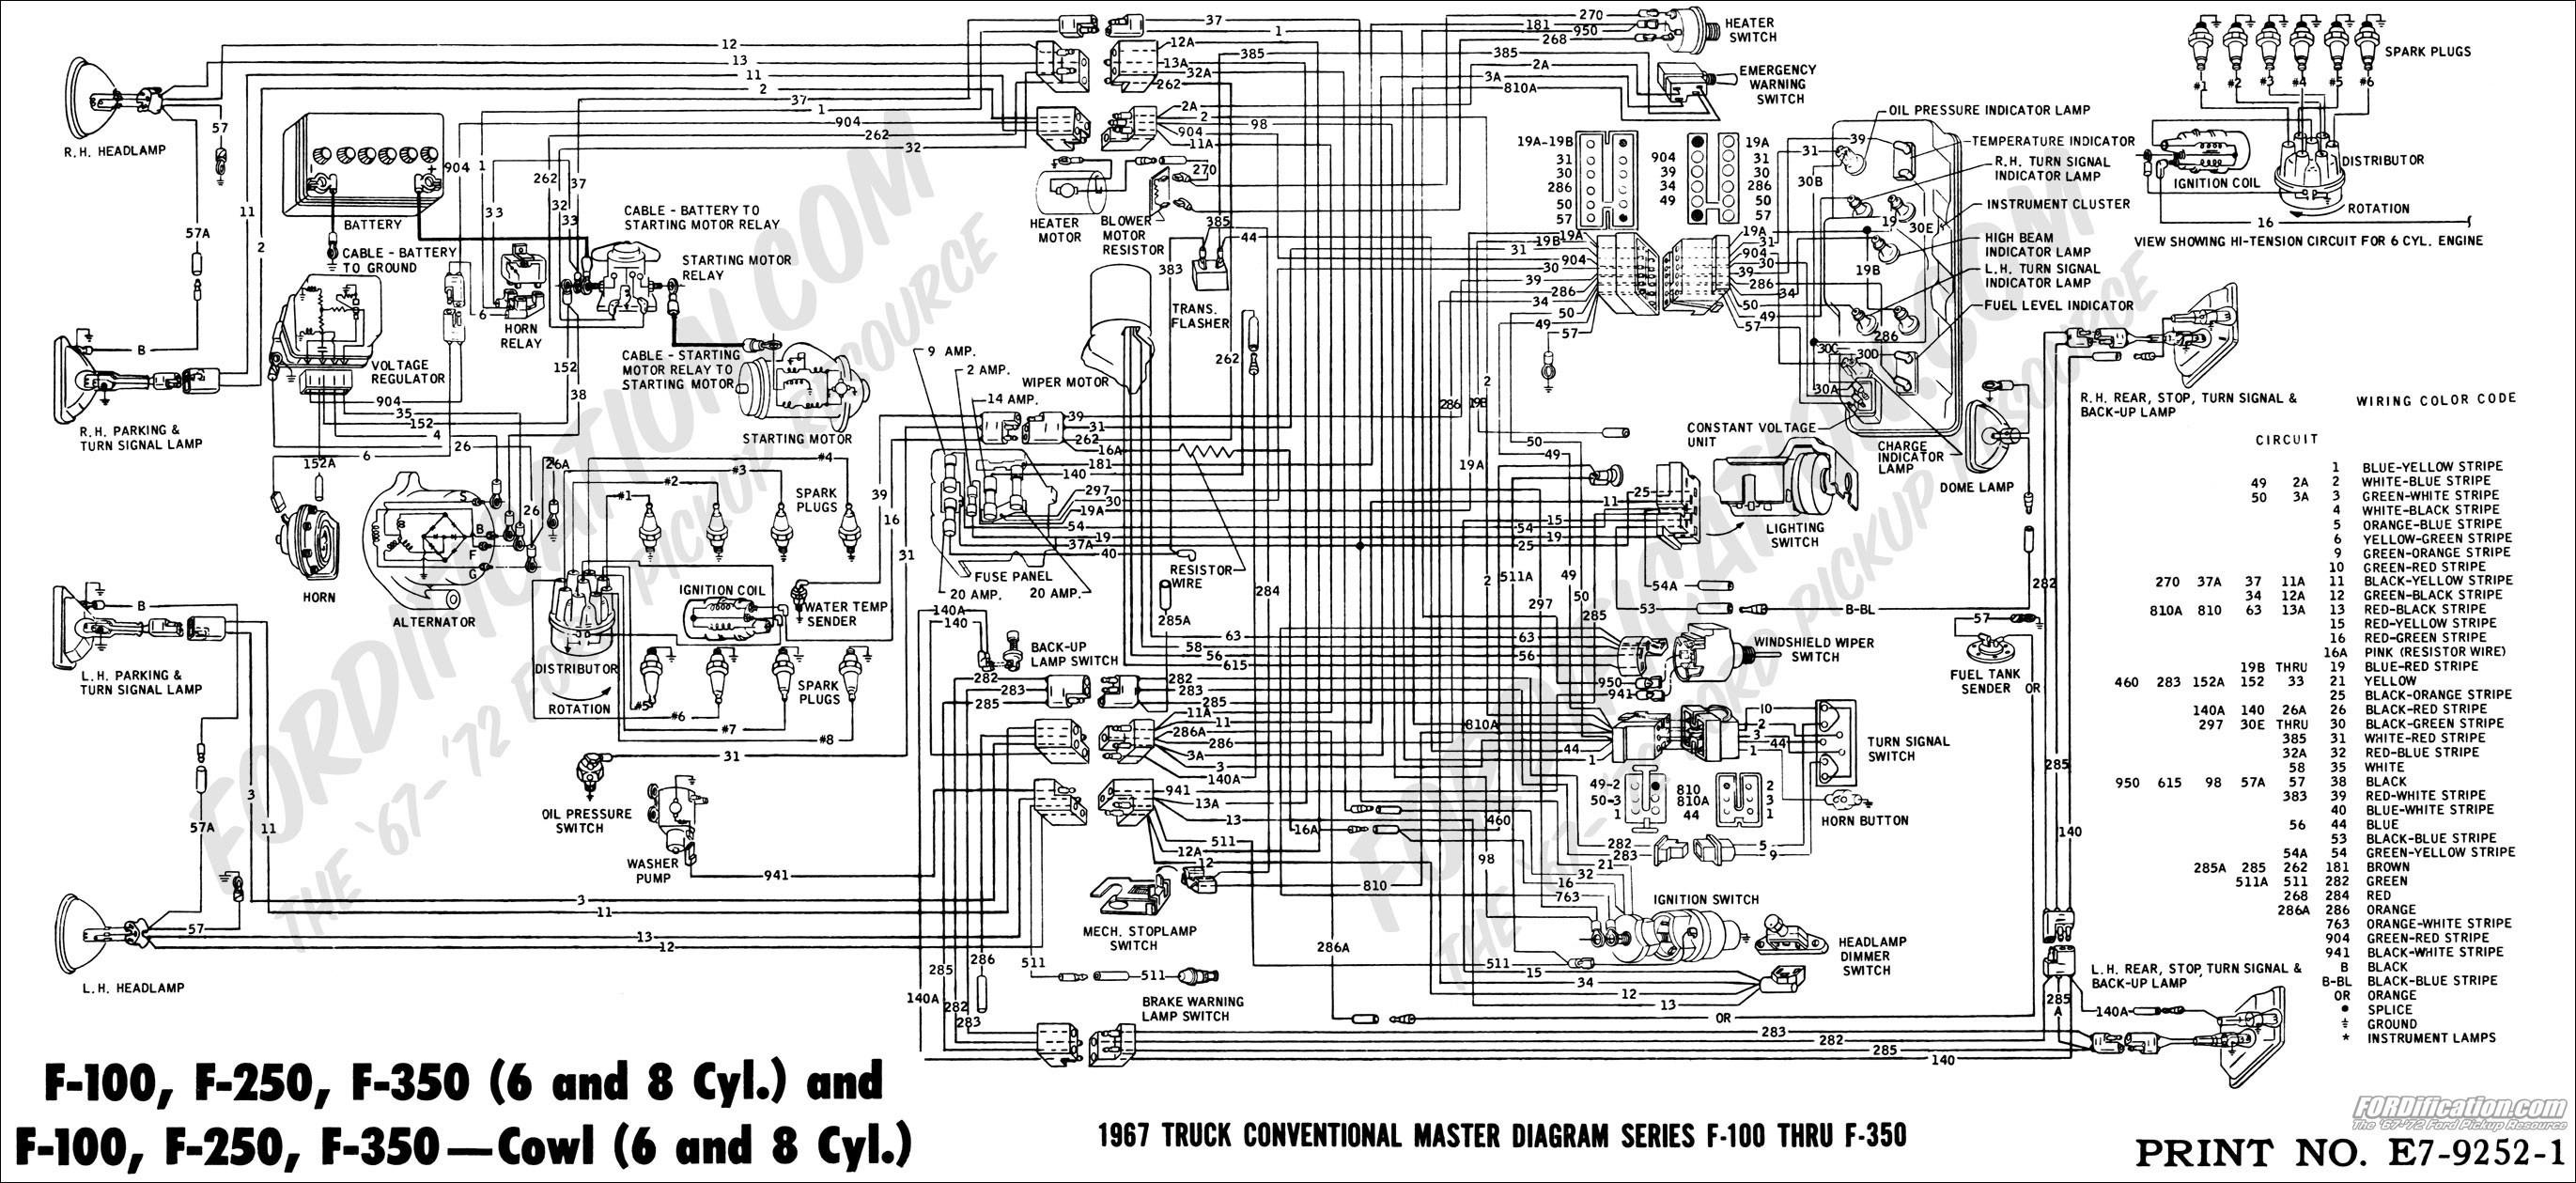 Wiring Diagrams Moreover Altivar 66 Diagram Likewise On Oil Gauge Free Download Schematic Rh Losirekb Pw